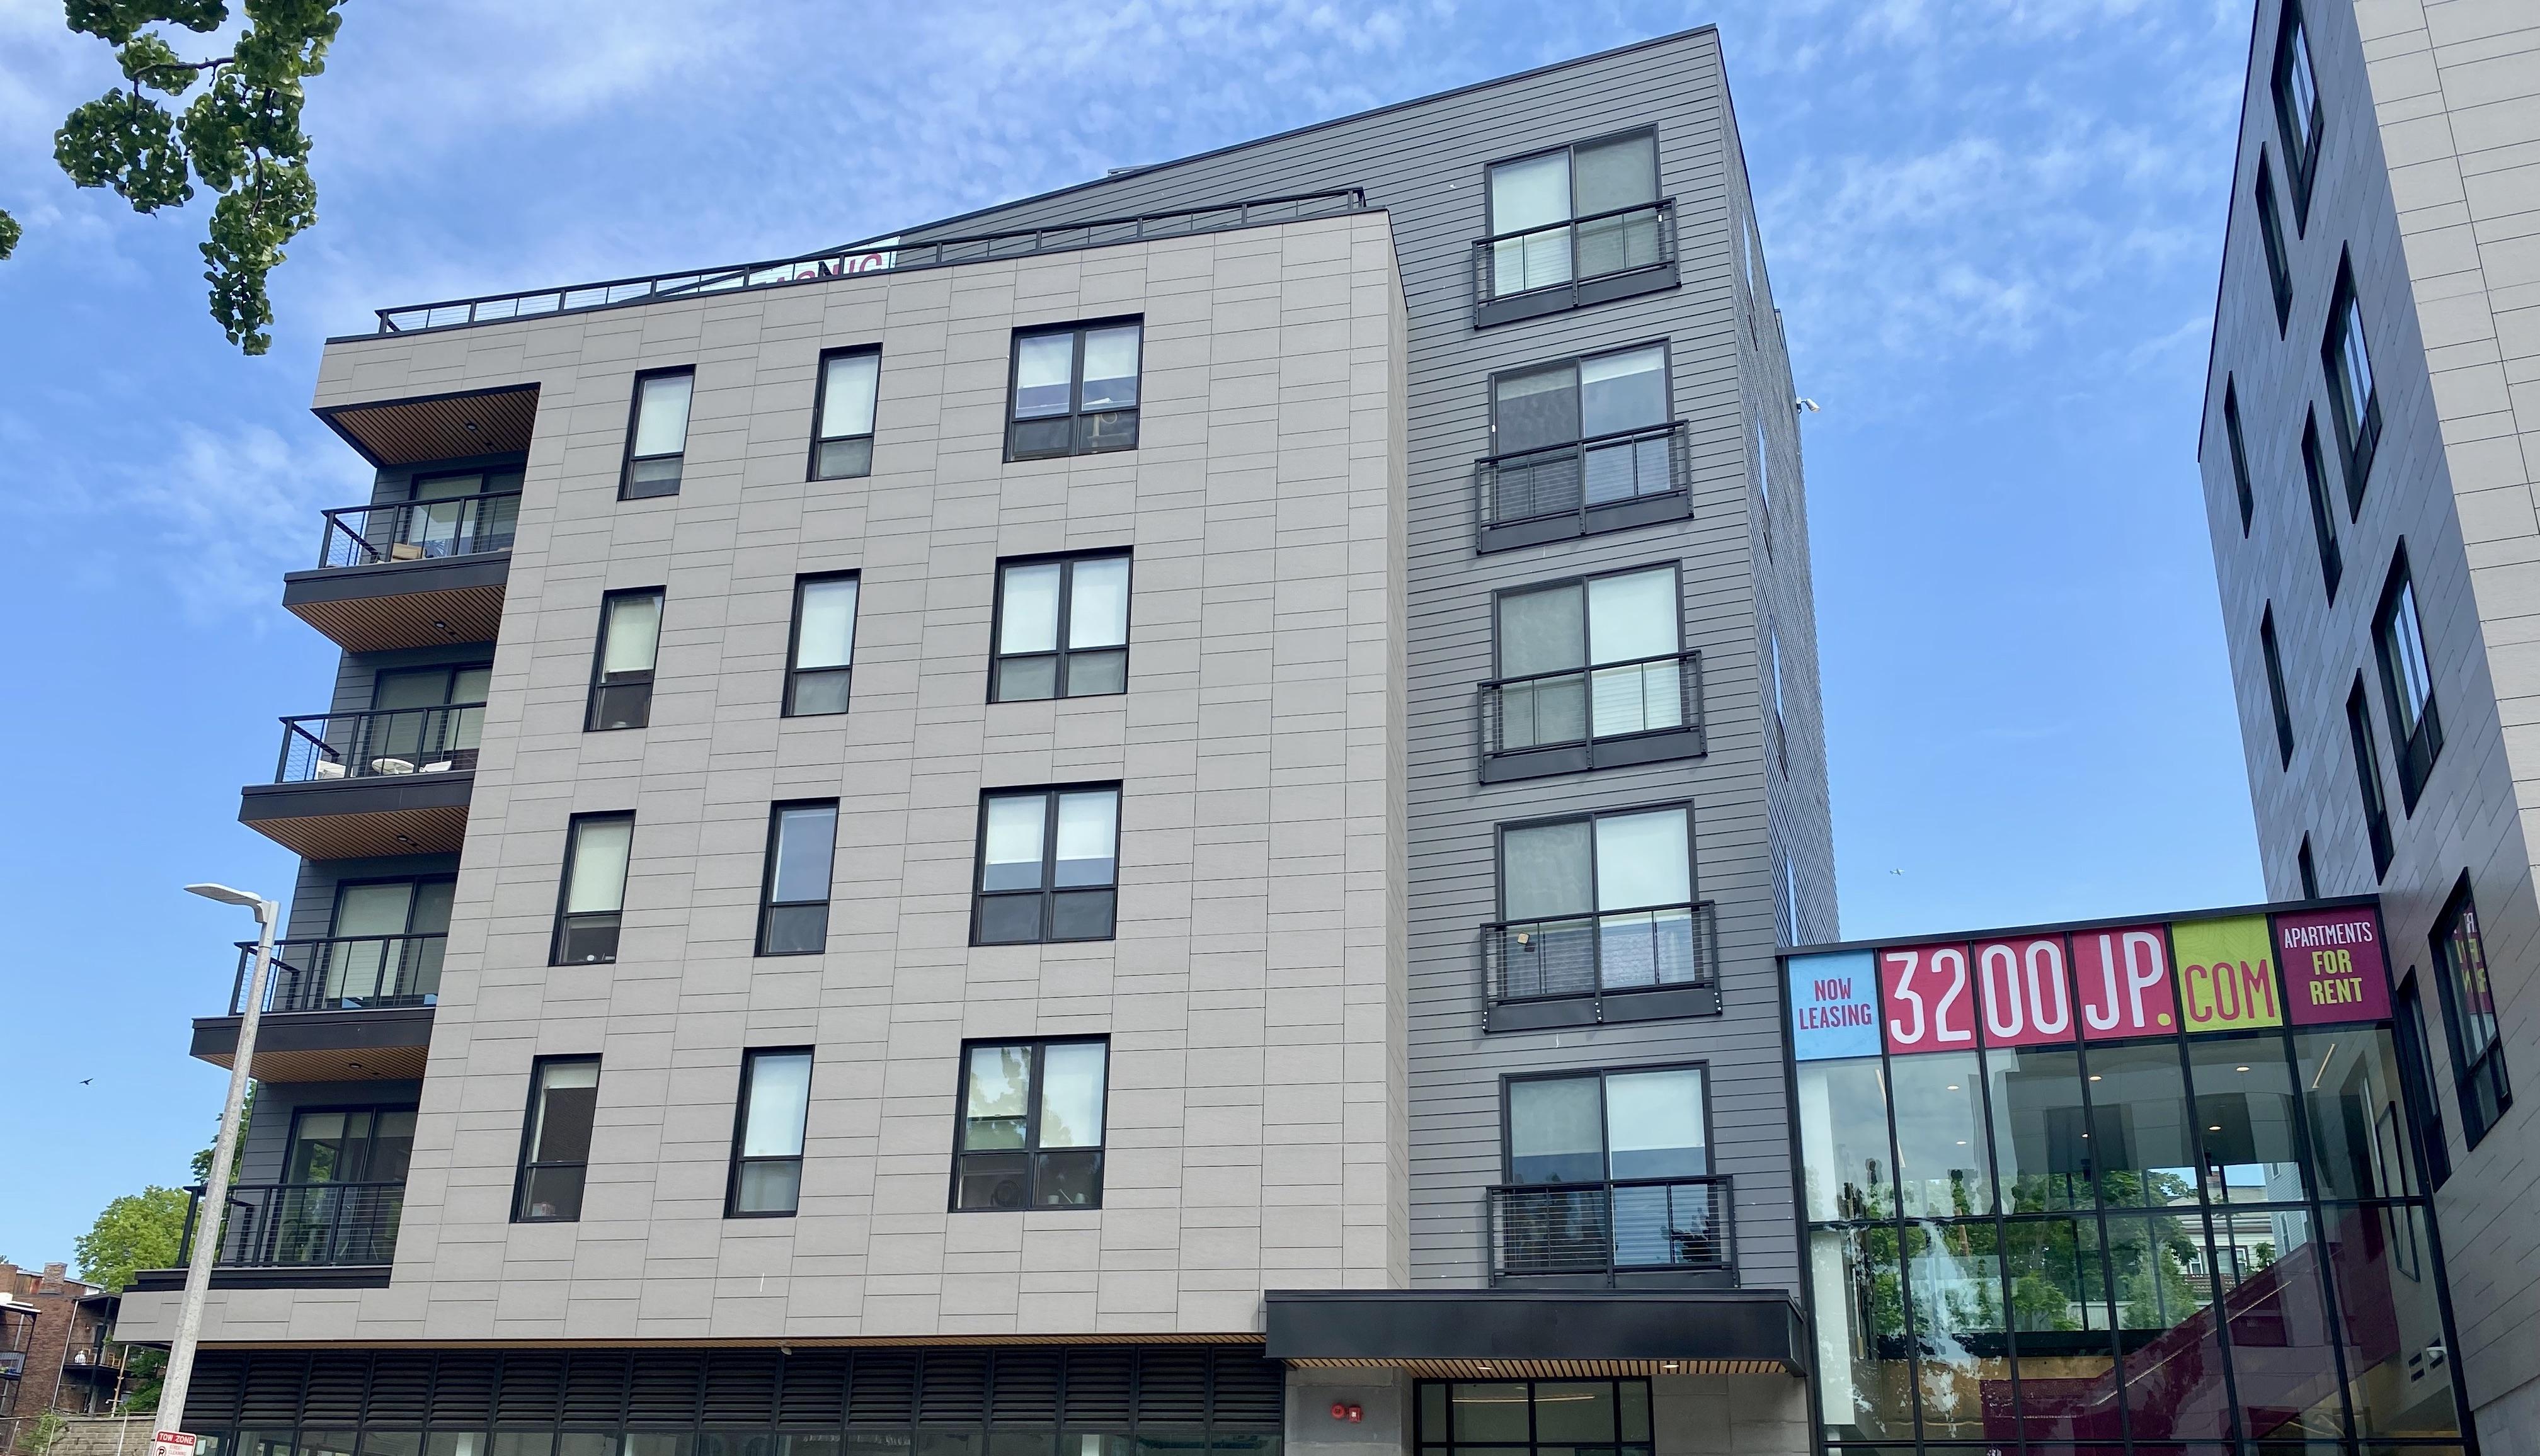 Luxe Washington Street Apartments in Jamaica Plain